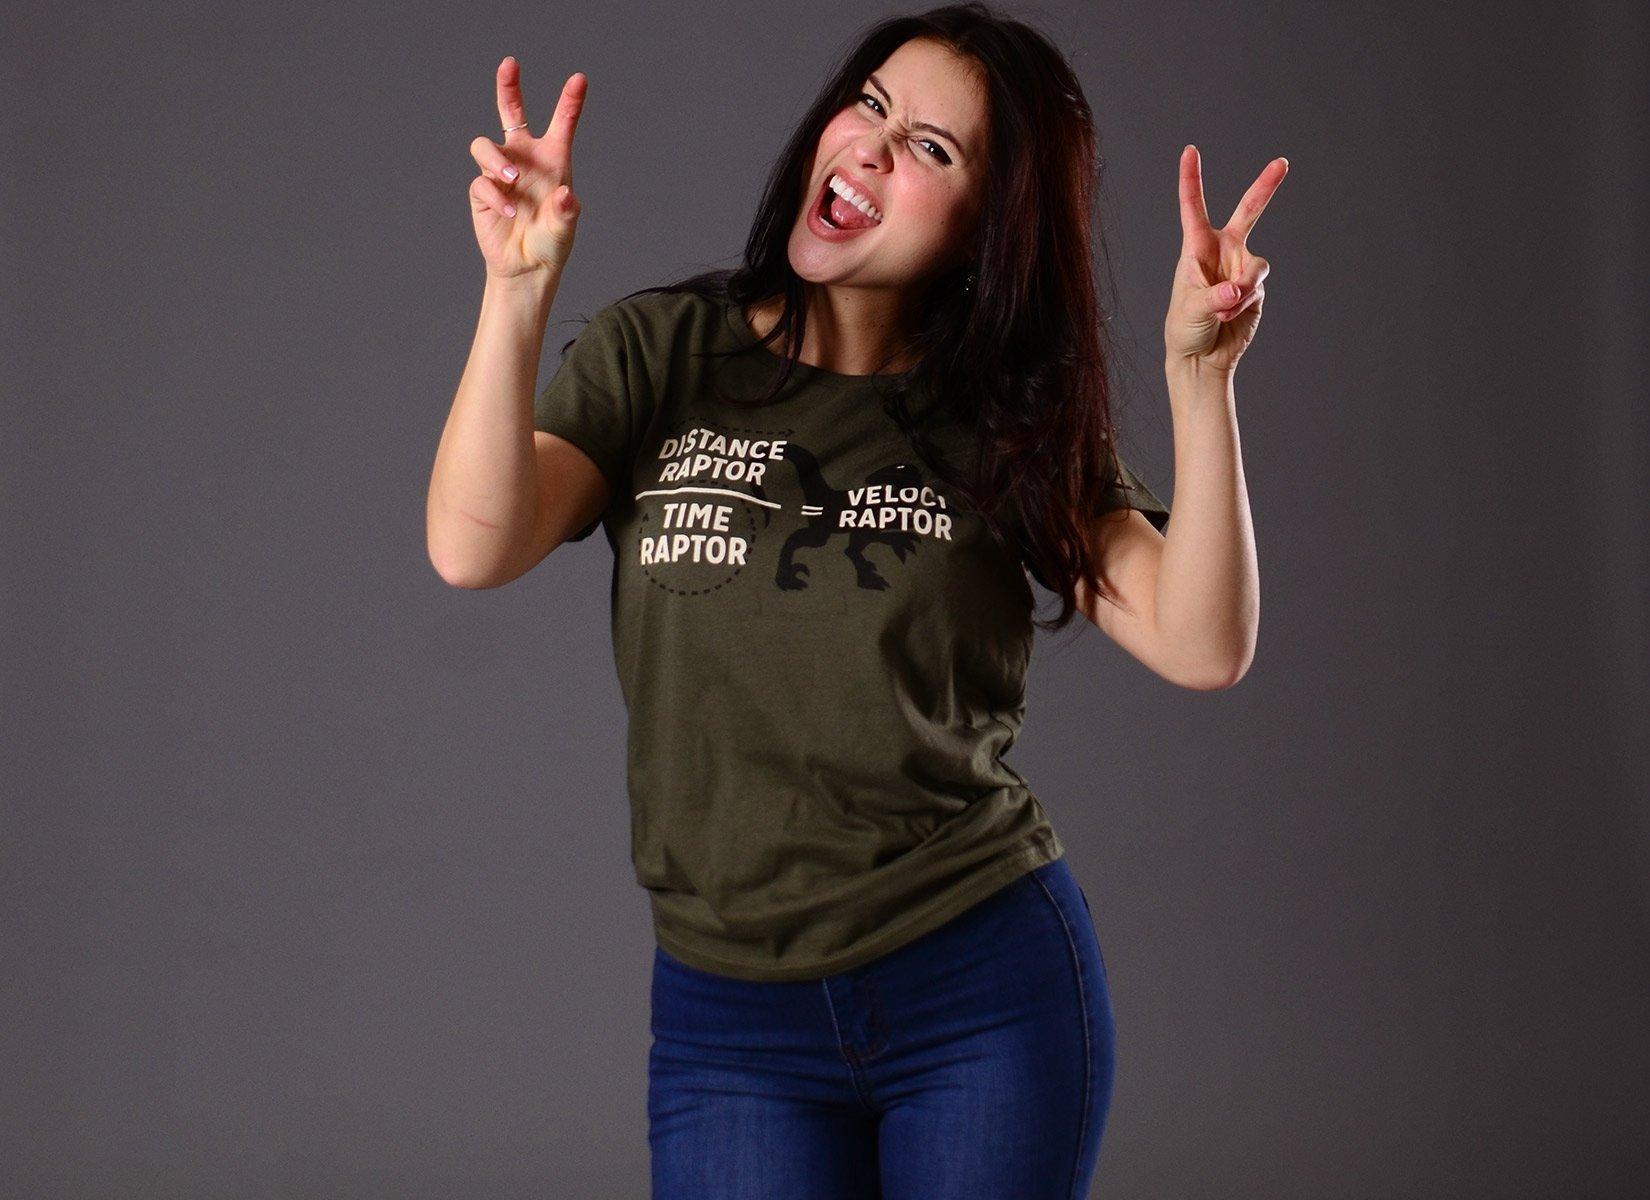 Veloci Raptor on Womens T-Shirt